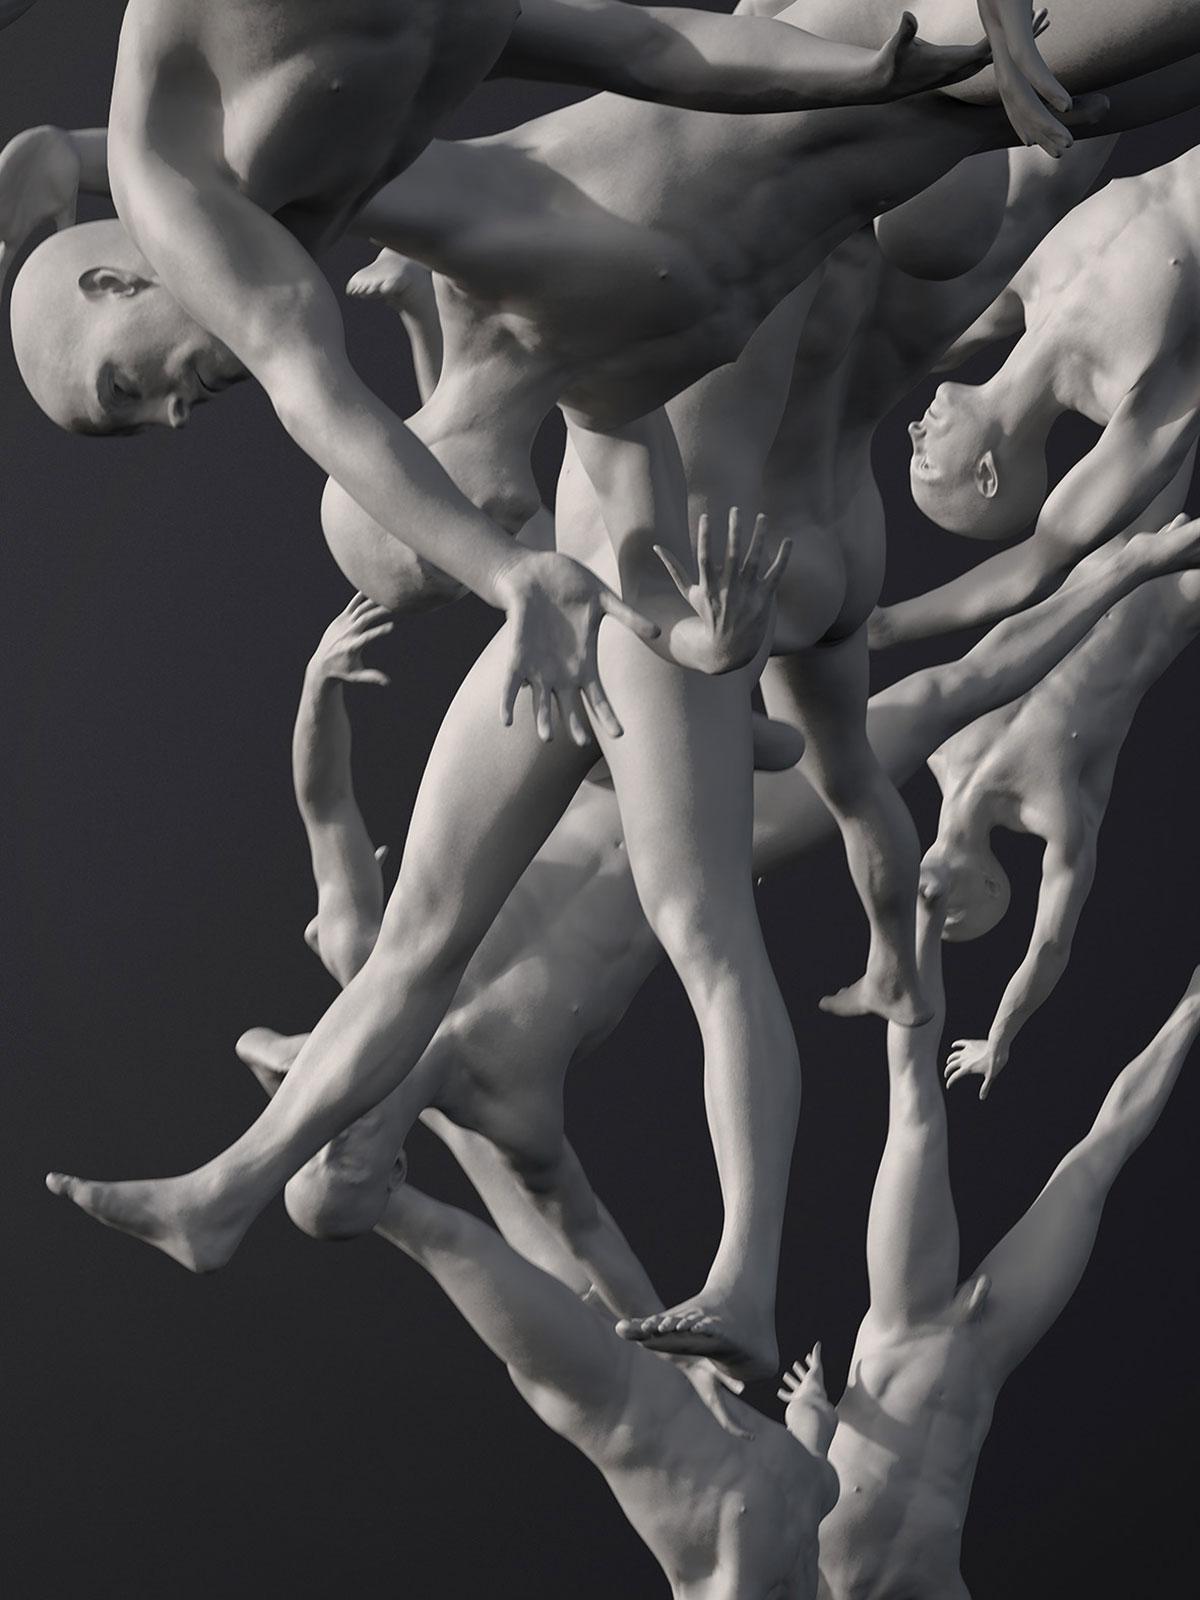 Palo Alto, Avatar I, CGI Fine Art Print, 140 x 105 cm, 2018